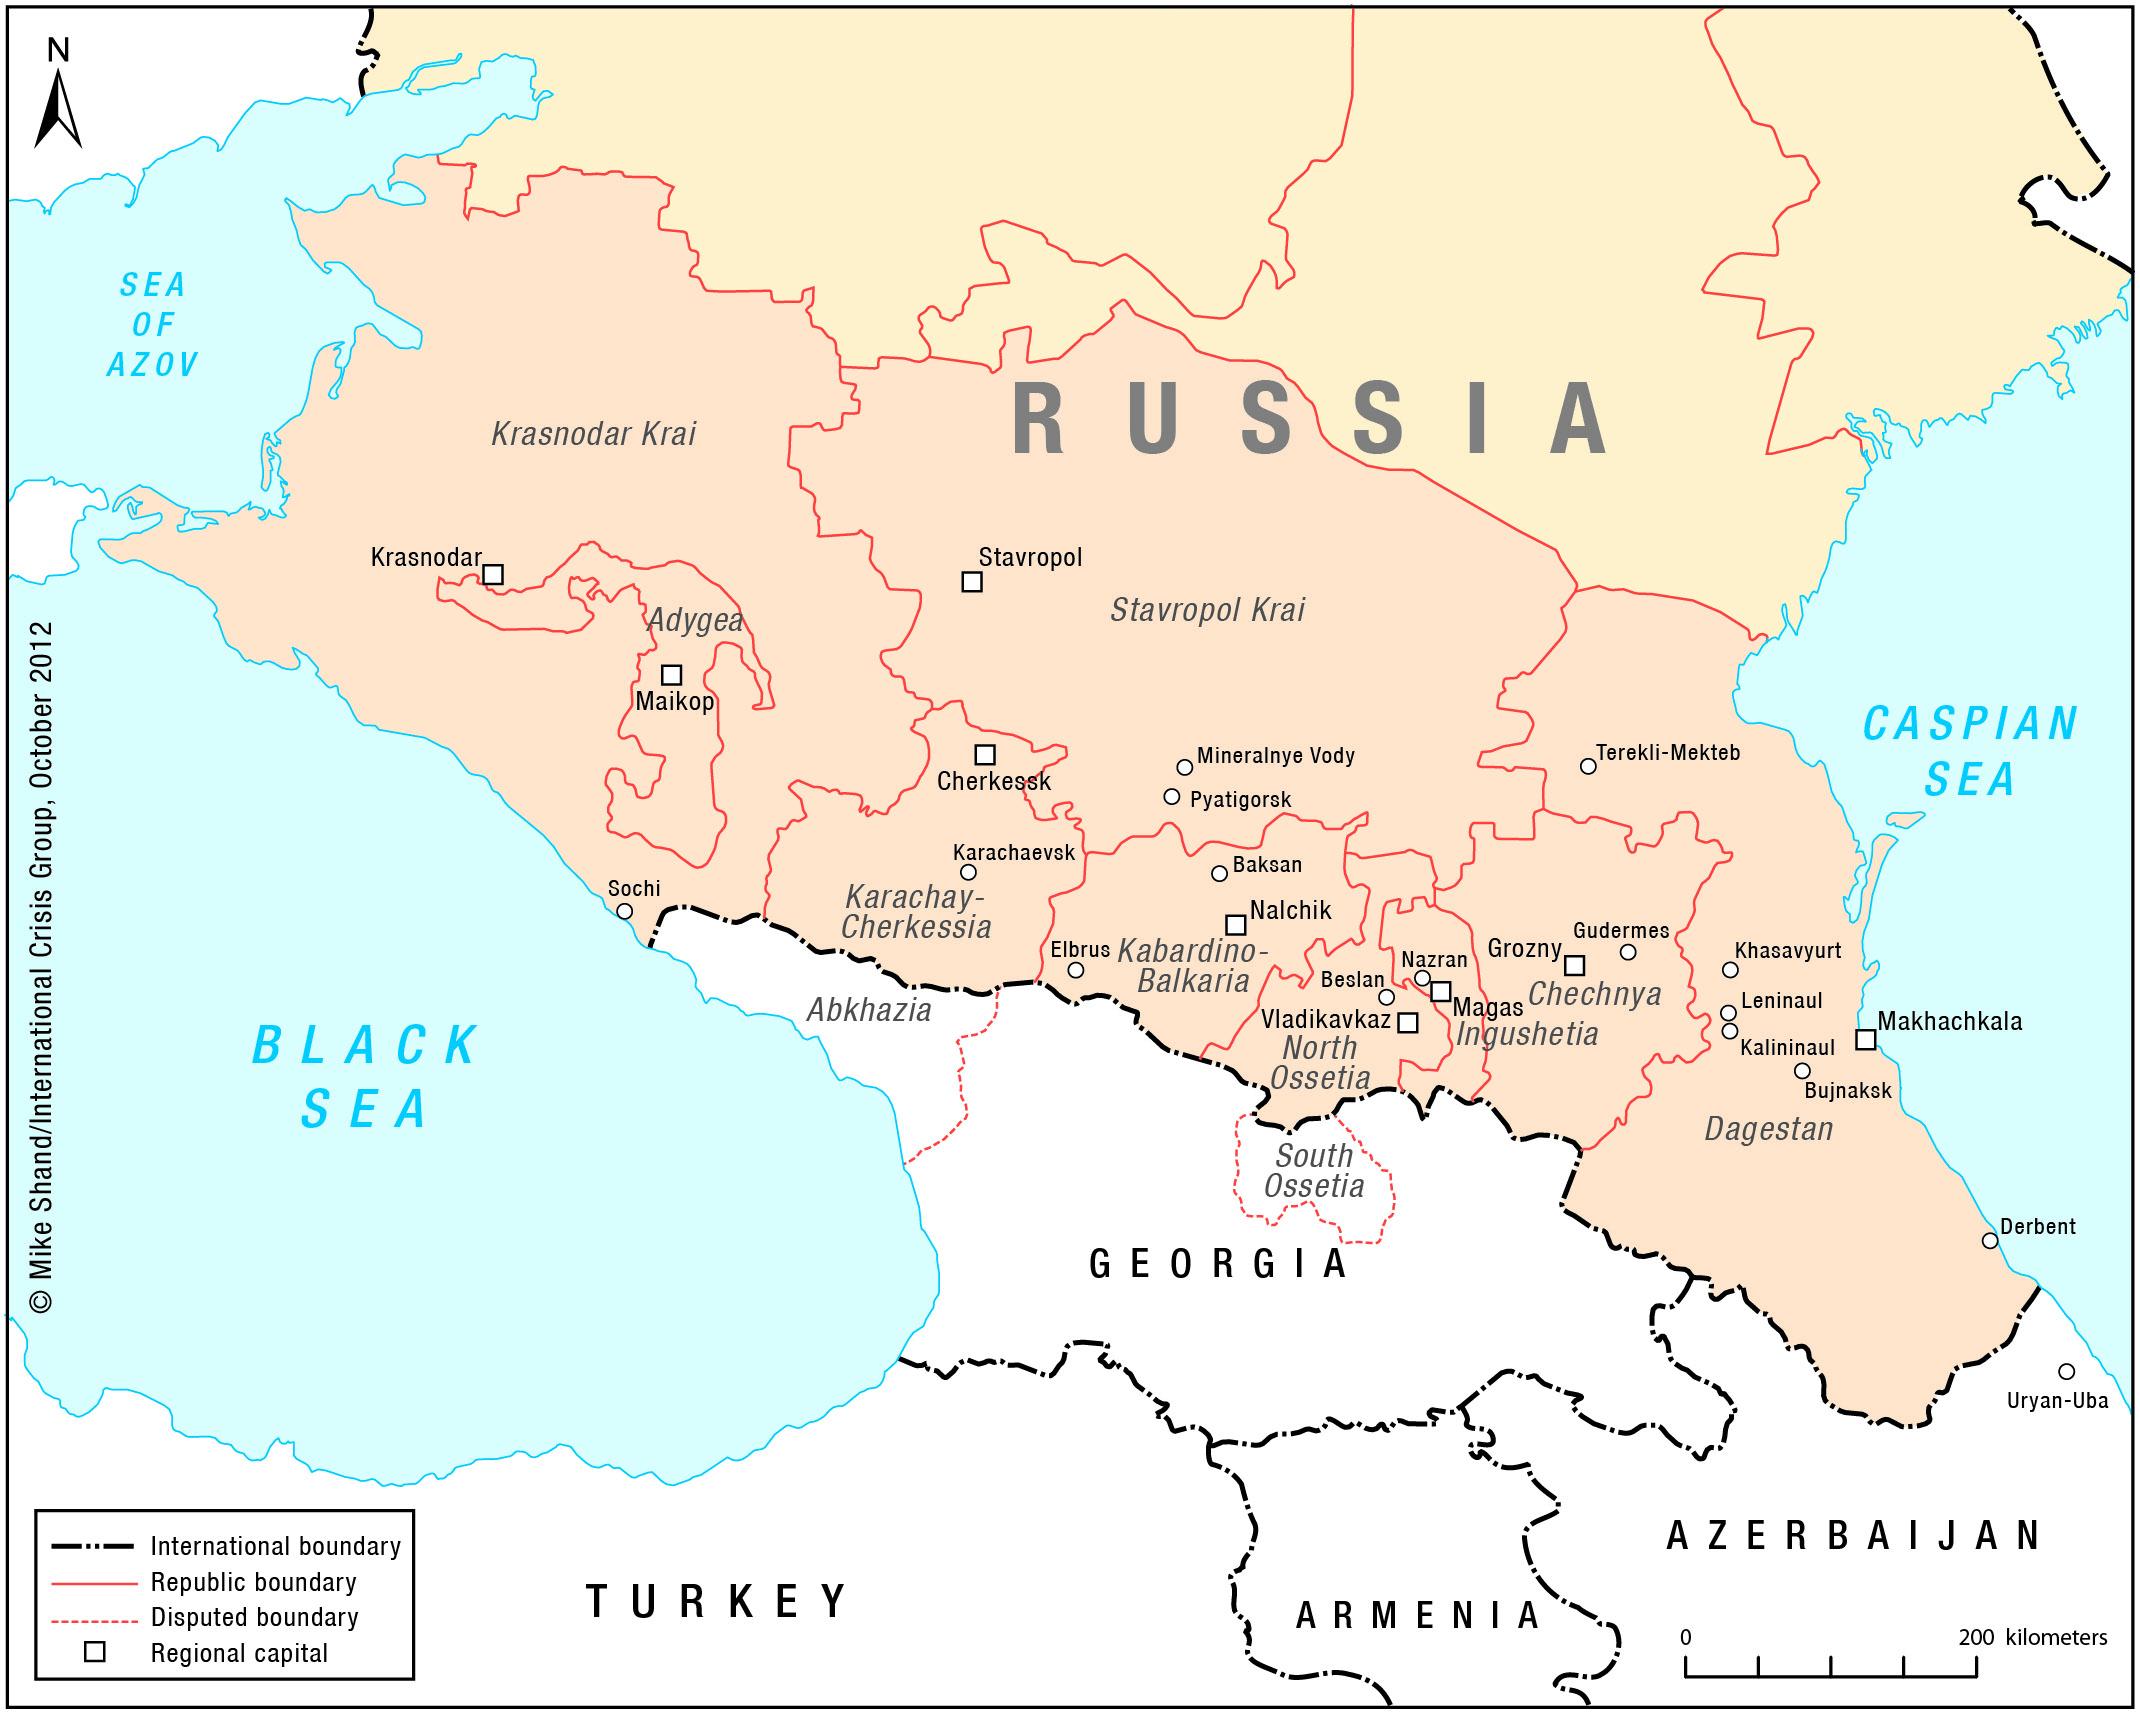 High Resolution Wallpaper | Caucasus 2140x1714 px